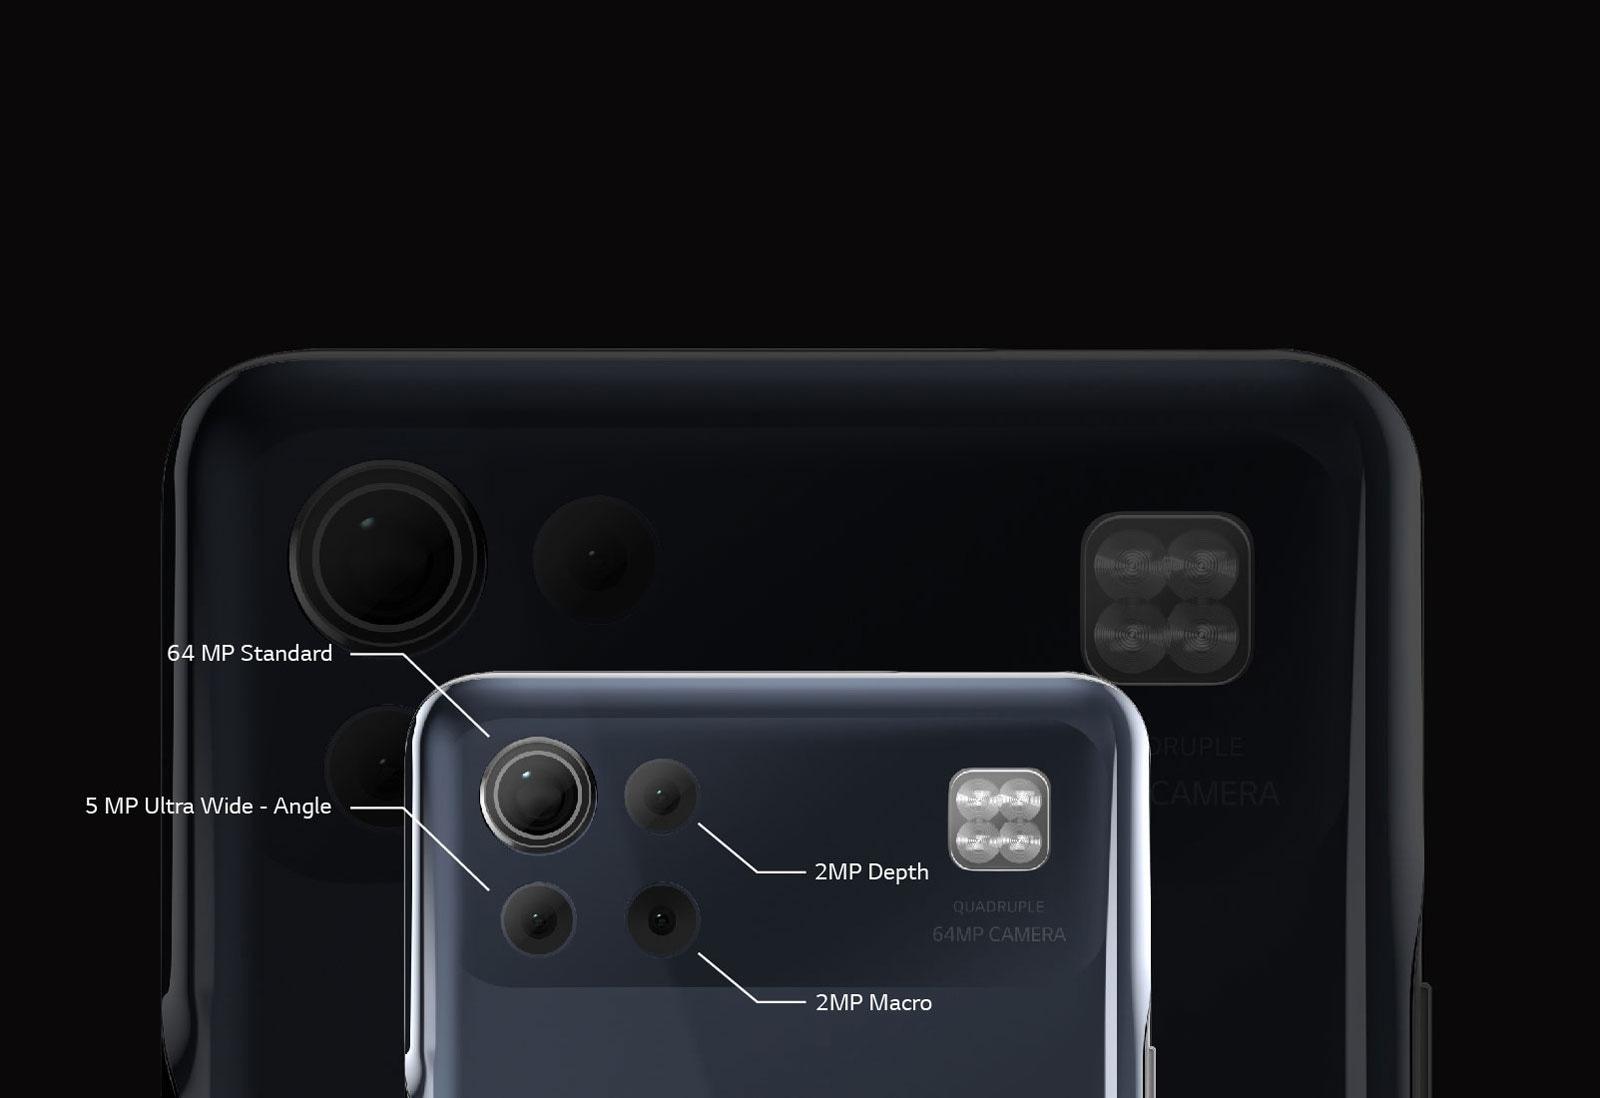 Image of quad camera on phone